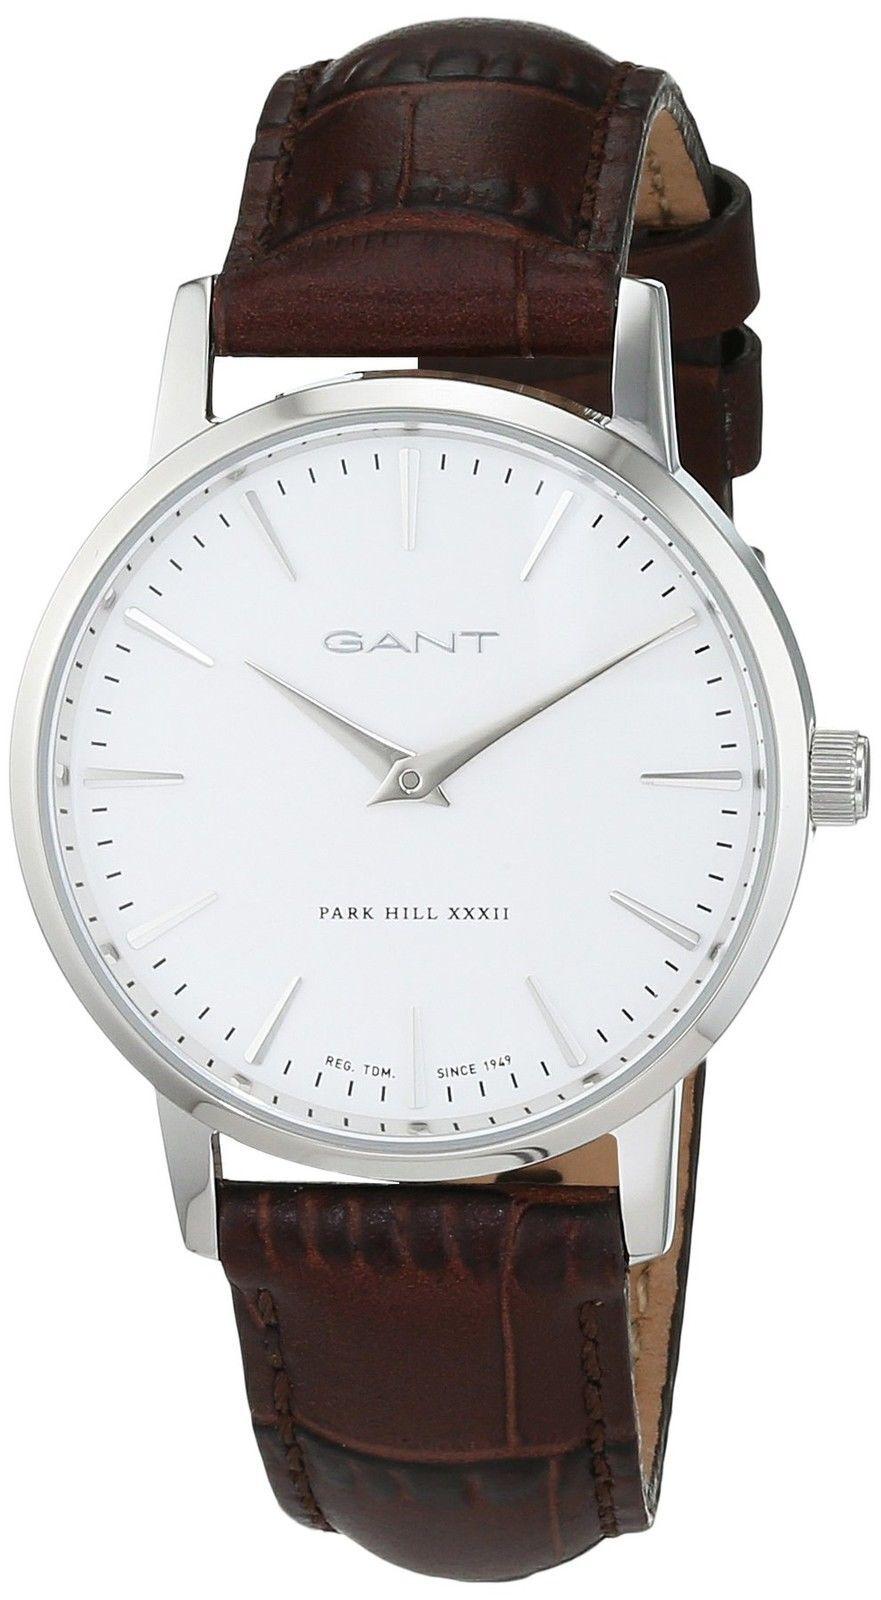 Gant 99999 Damklocka W11401 Vit/Läder Ø32 mm - Gant